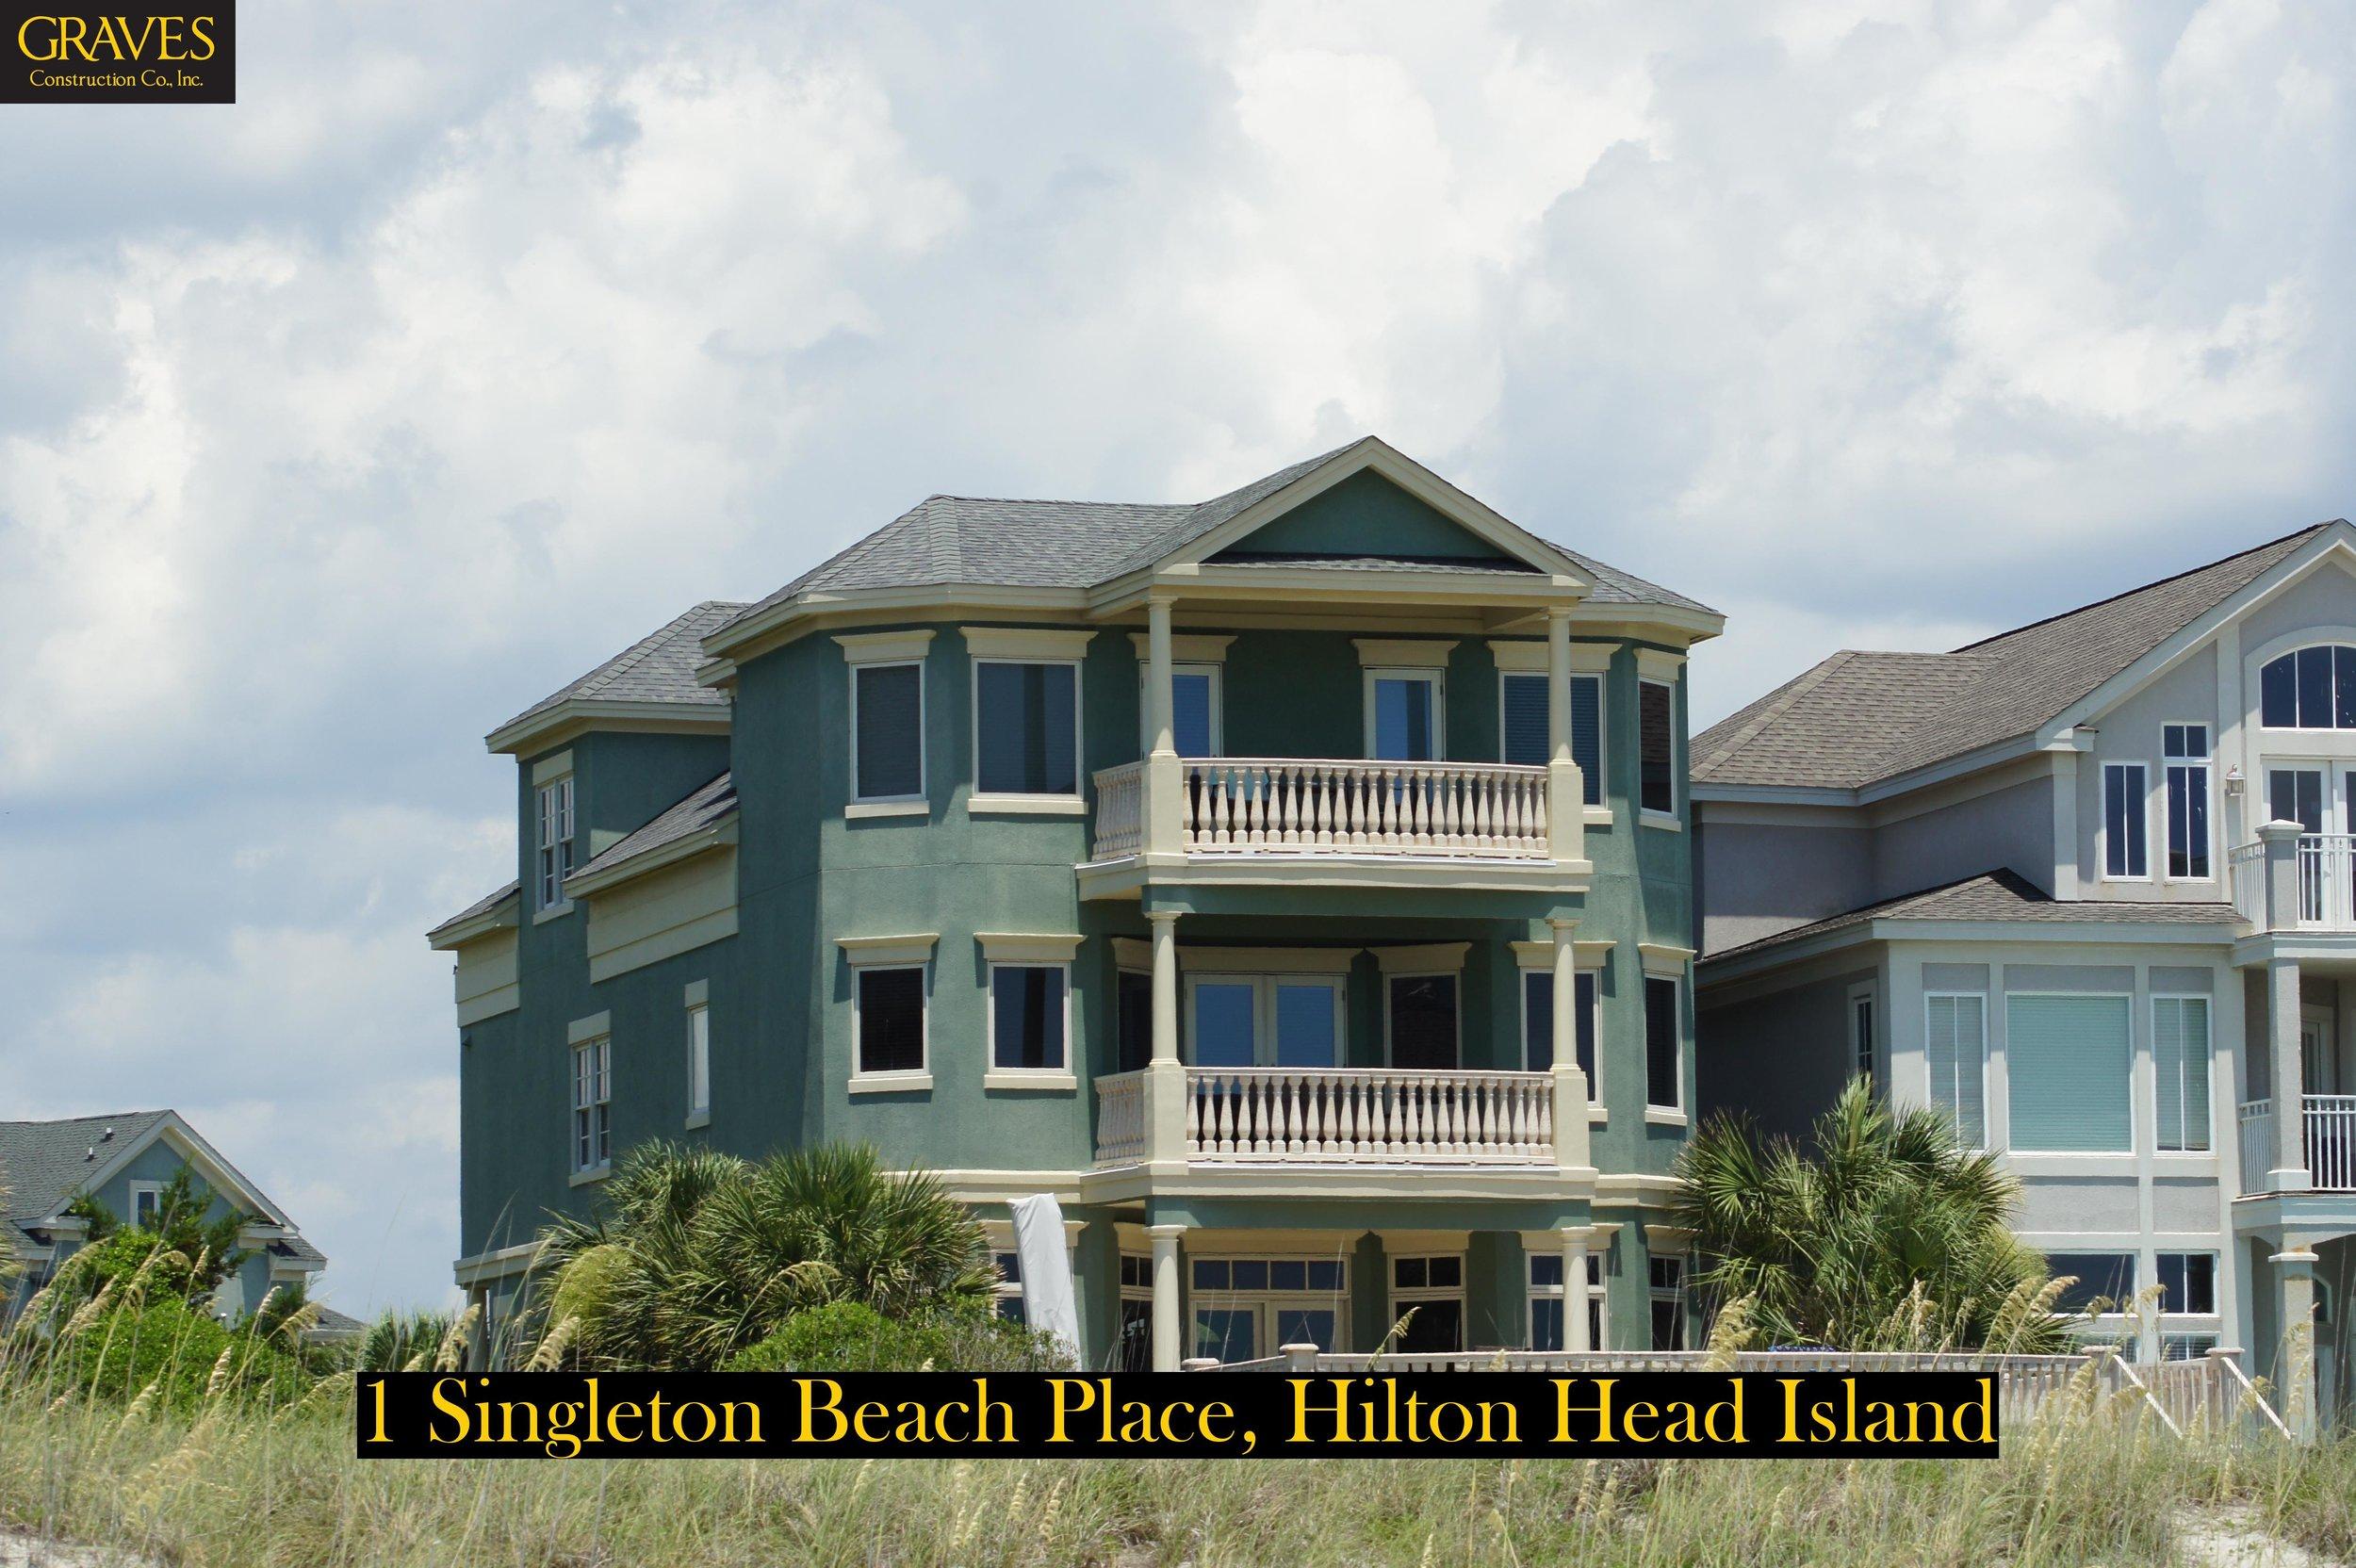 1 Singleton Beach Pl - 4